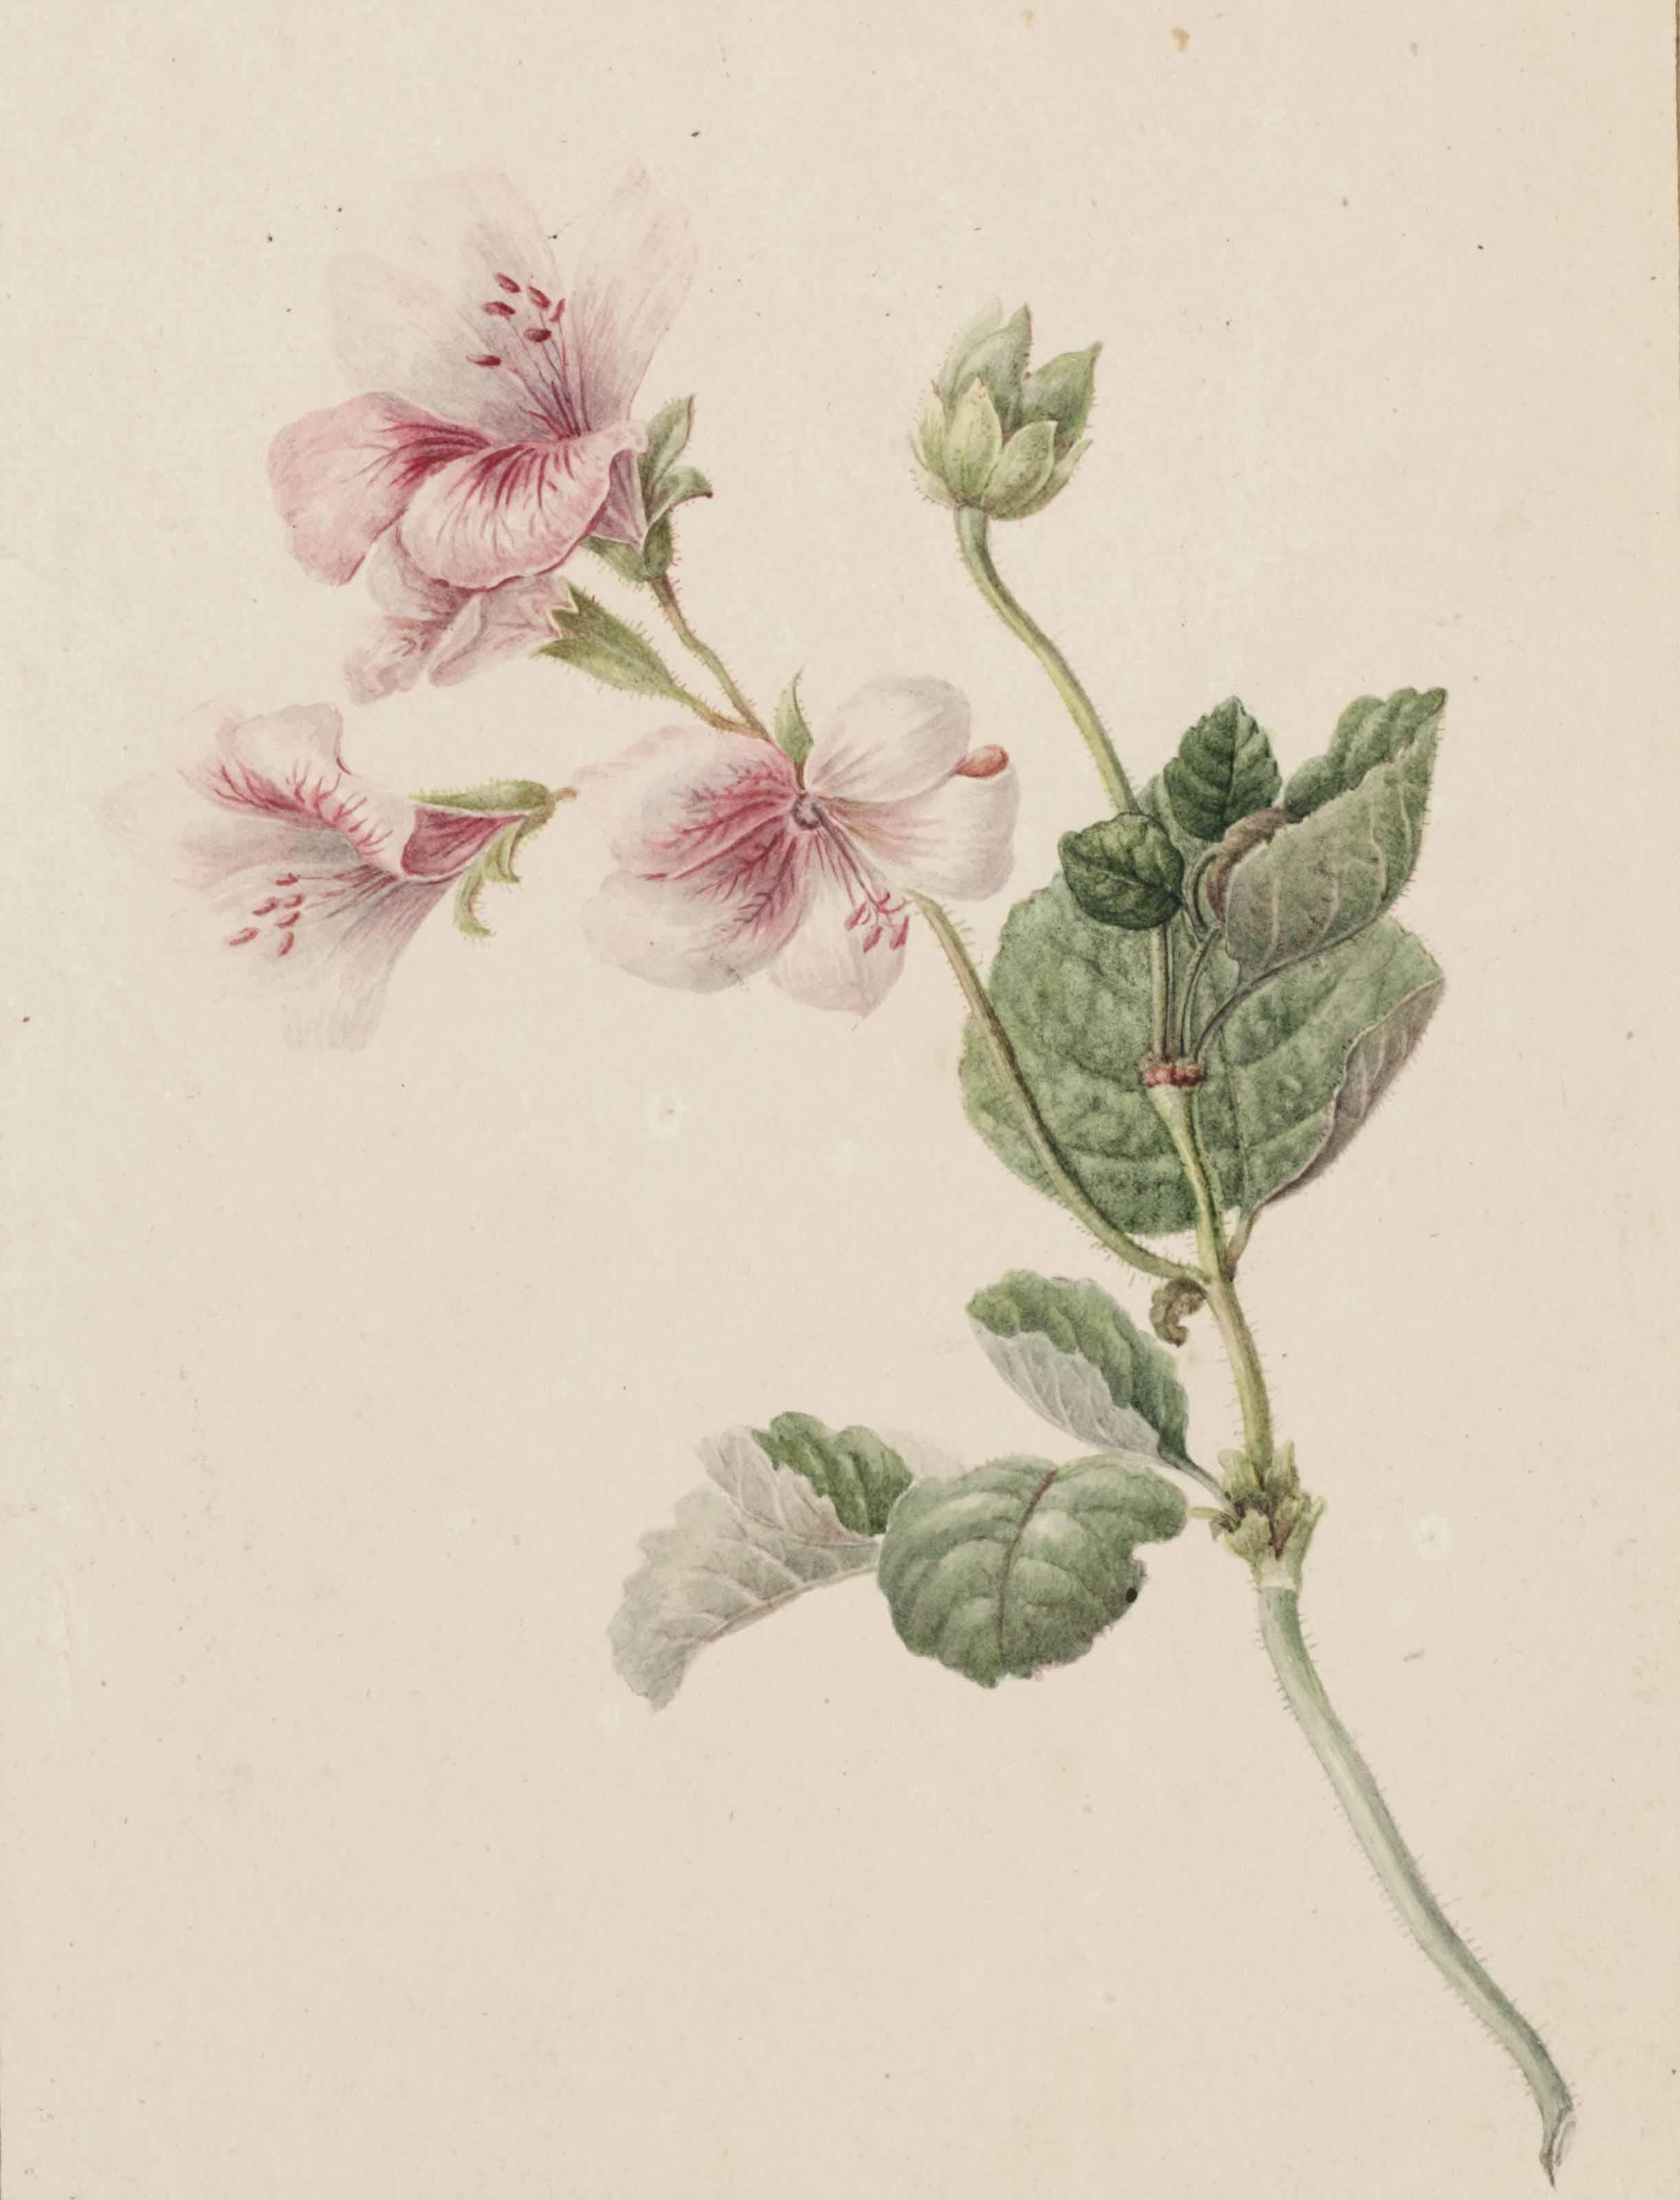 A spray of pink flowers (pelargonium)